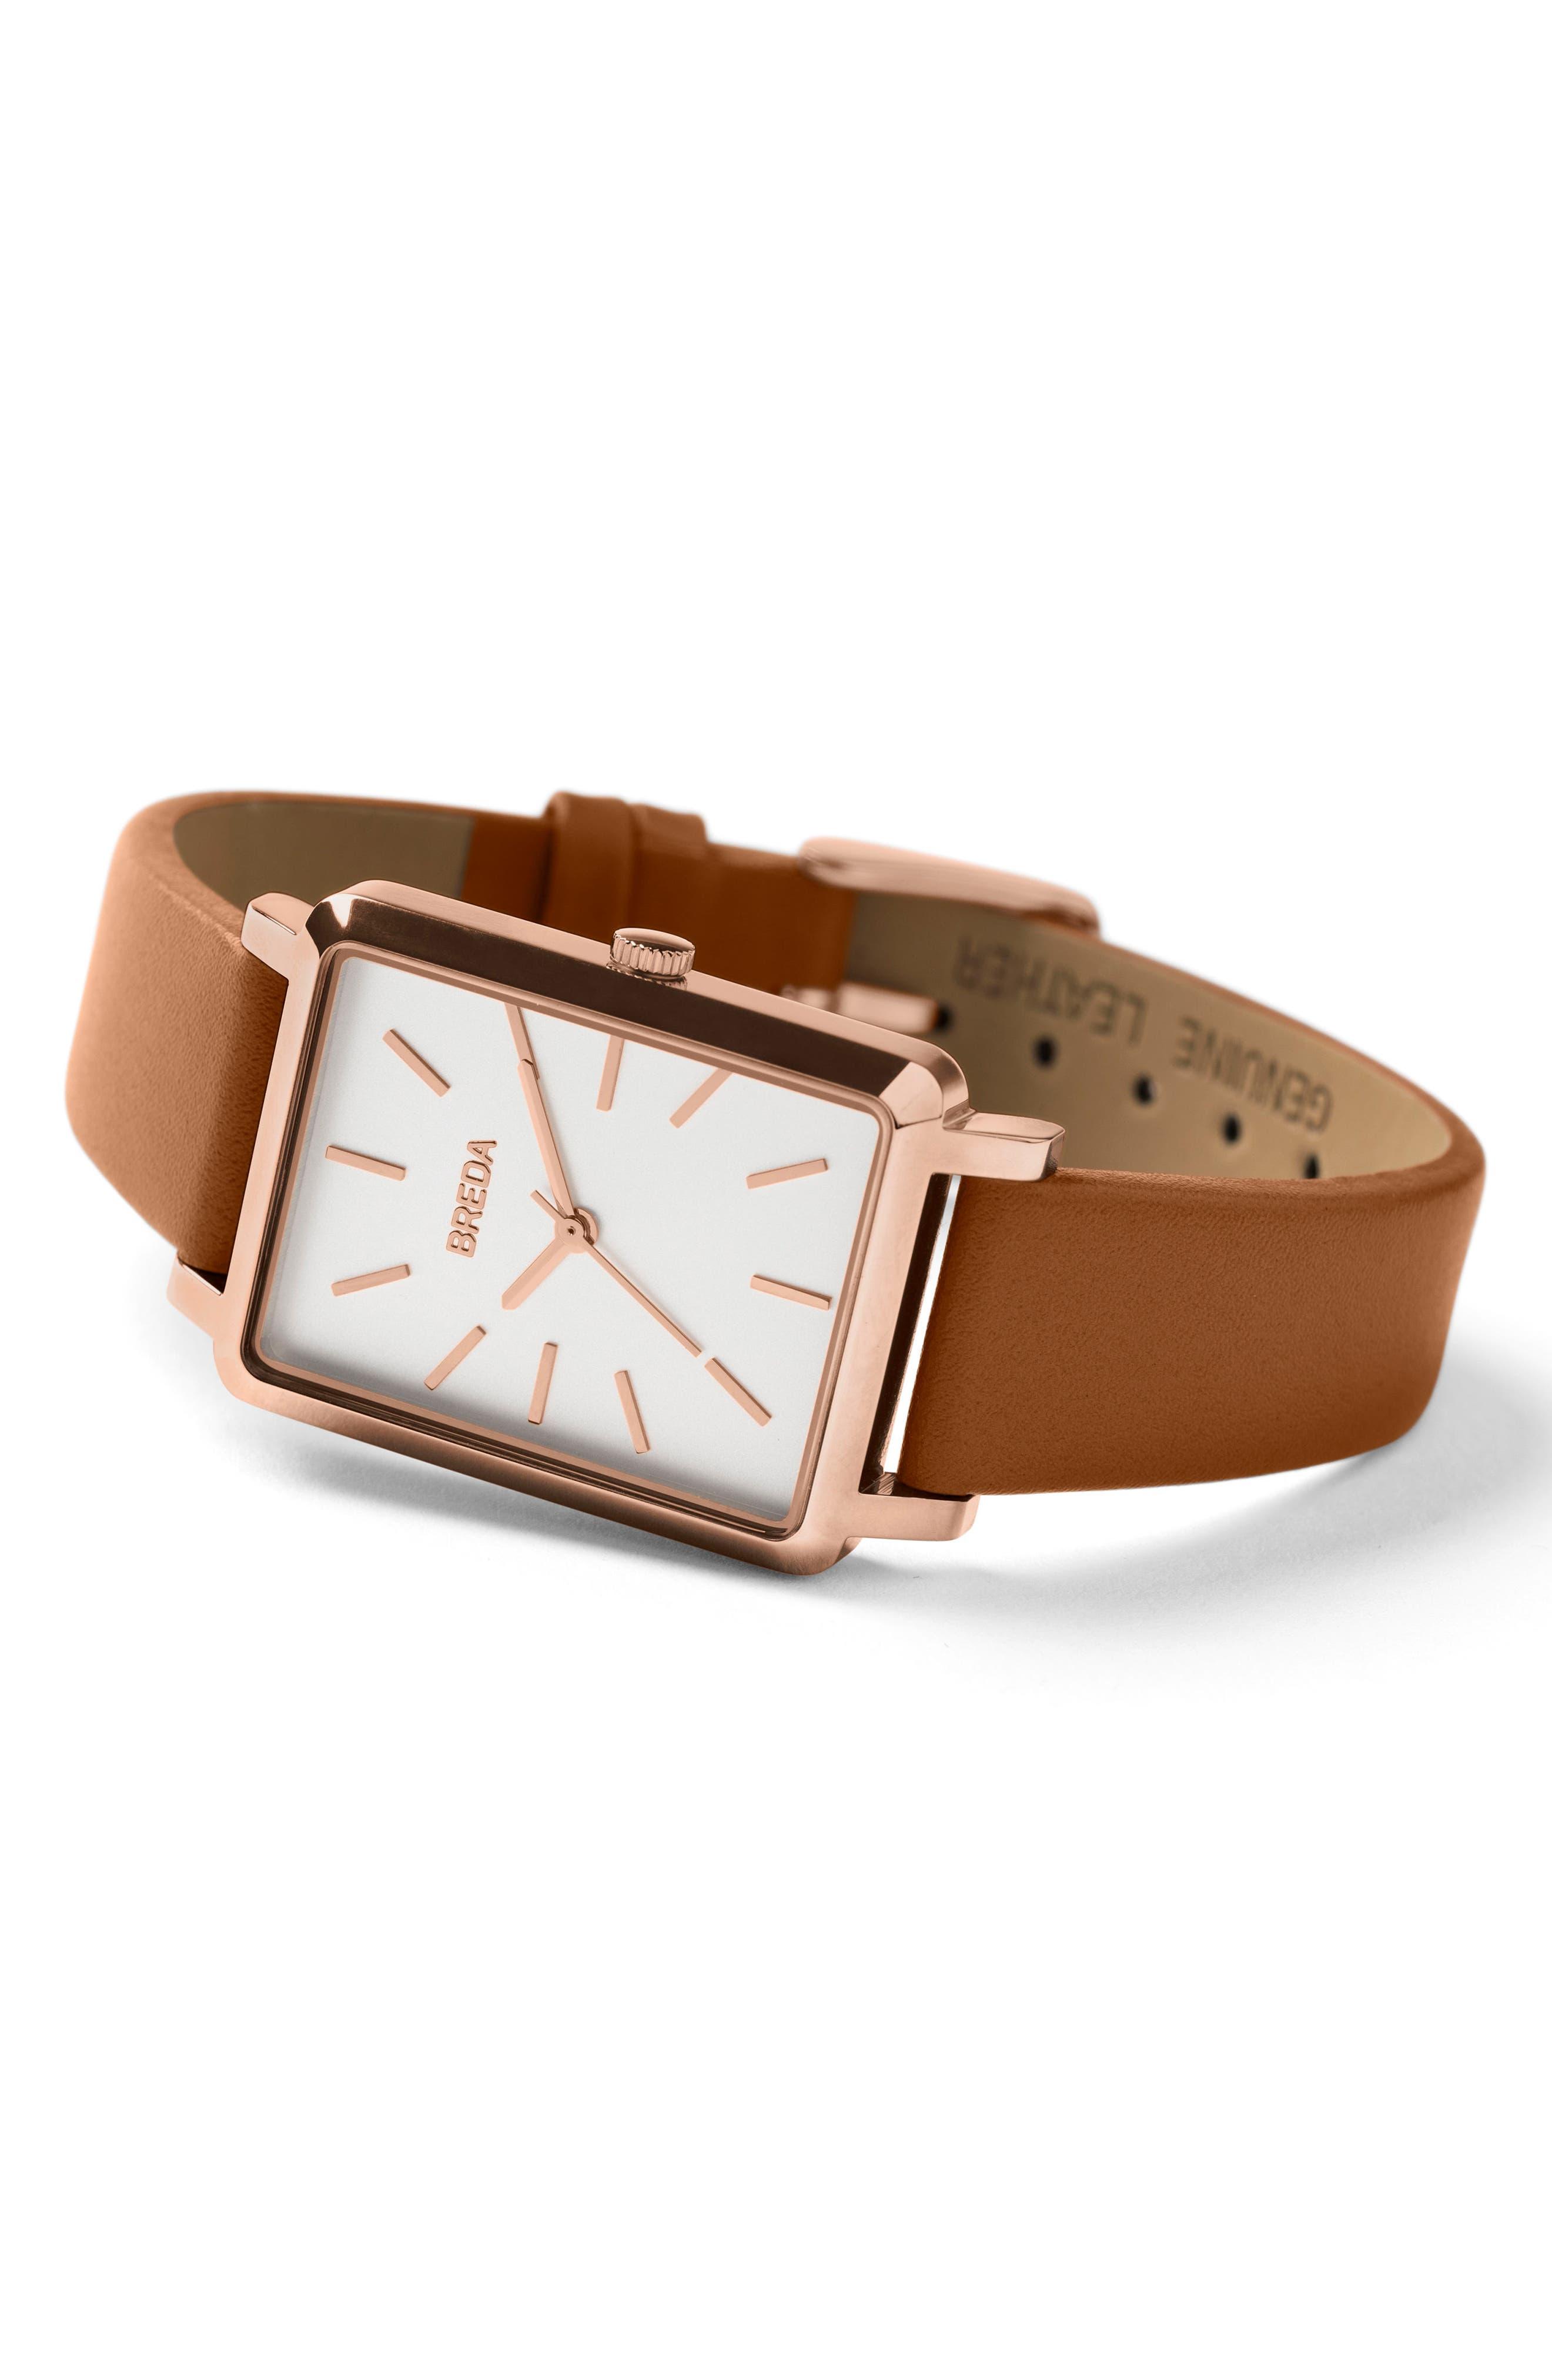 Baer Rectangular Leather Strap Watch, 26mm,                             Alternate thumbnail 8, color,